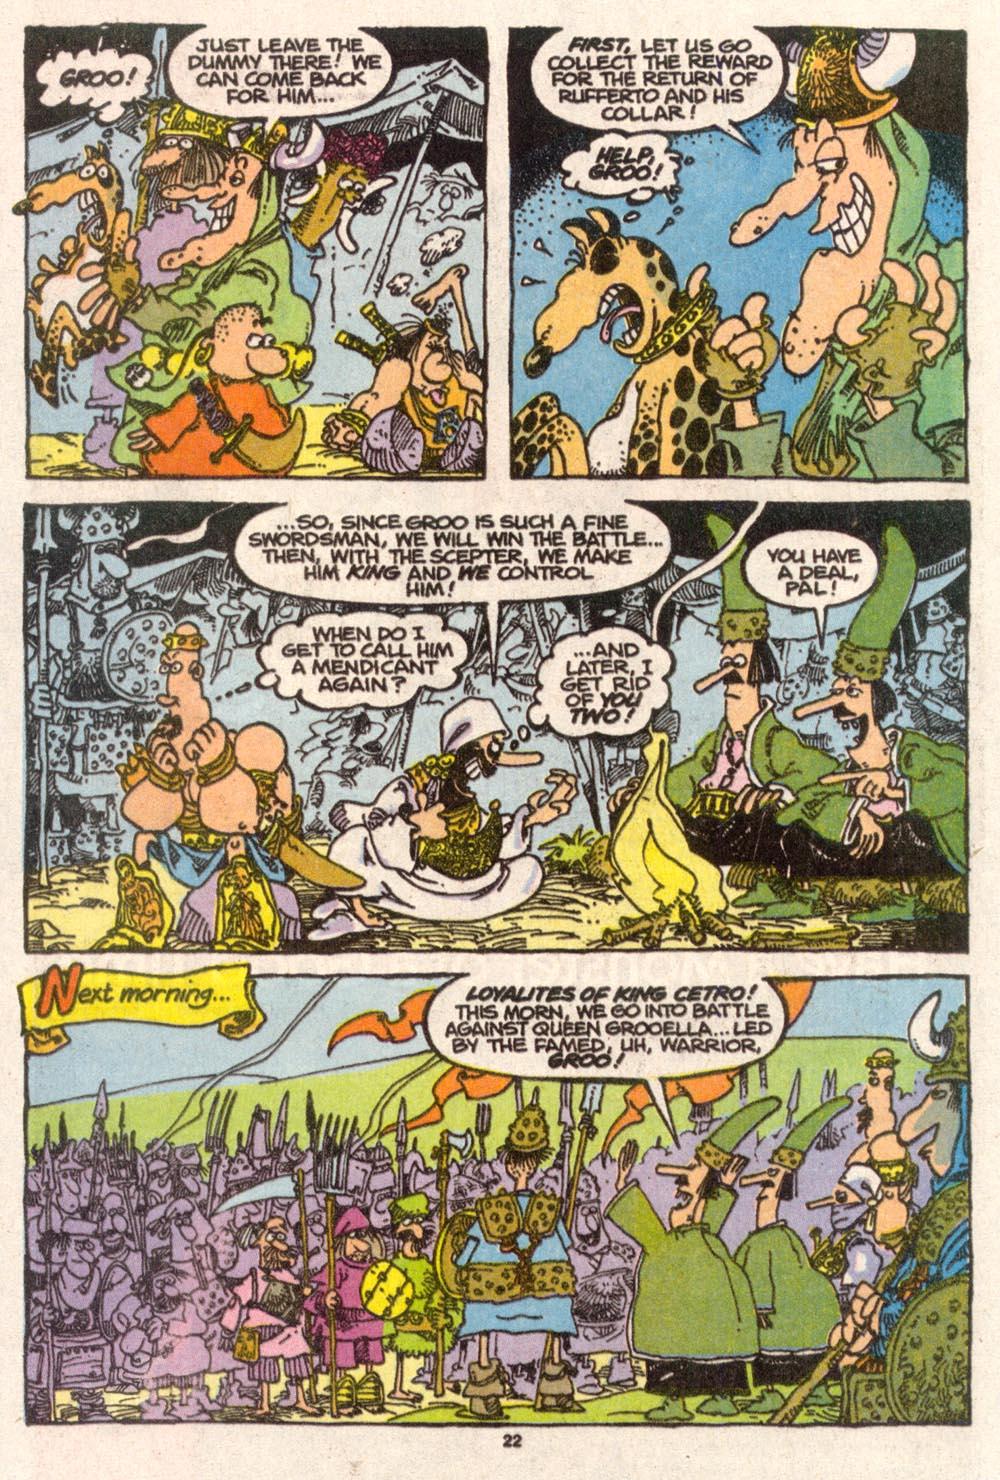 Read online Sergio Aragonés Groo the Wanderer comic -  Issue #74 - 17